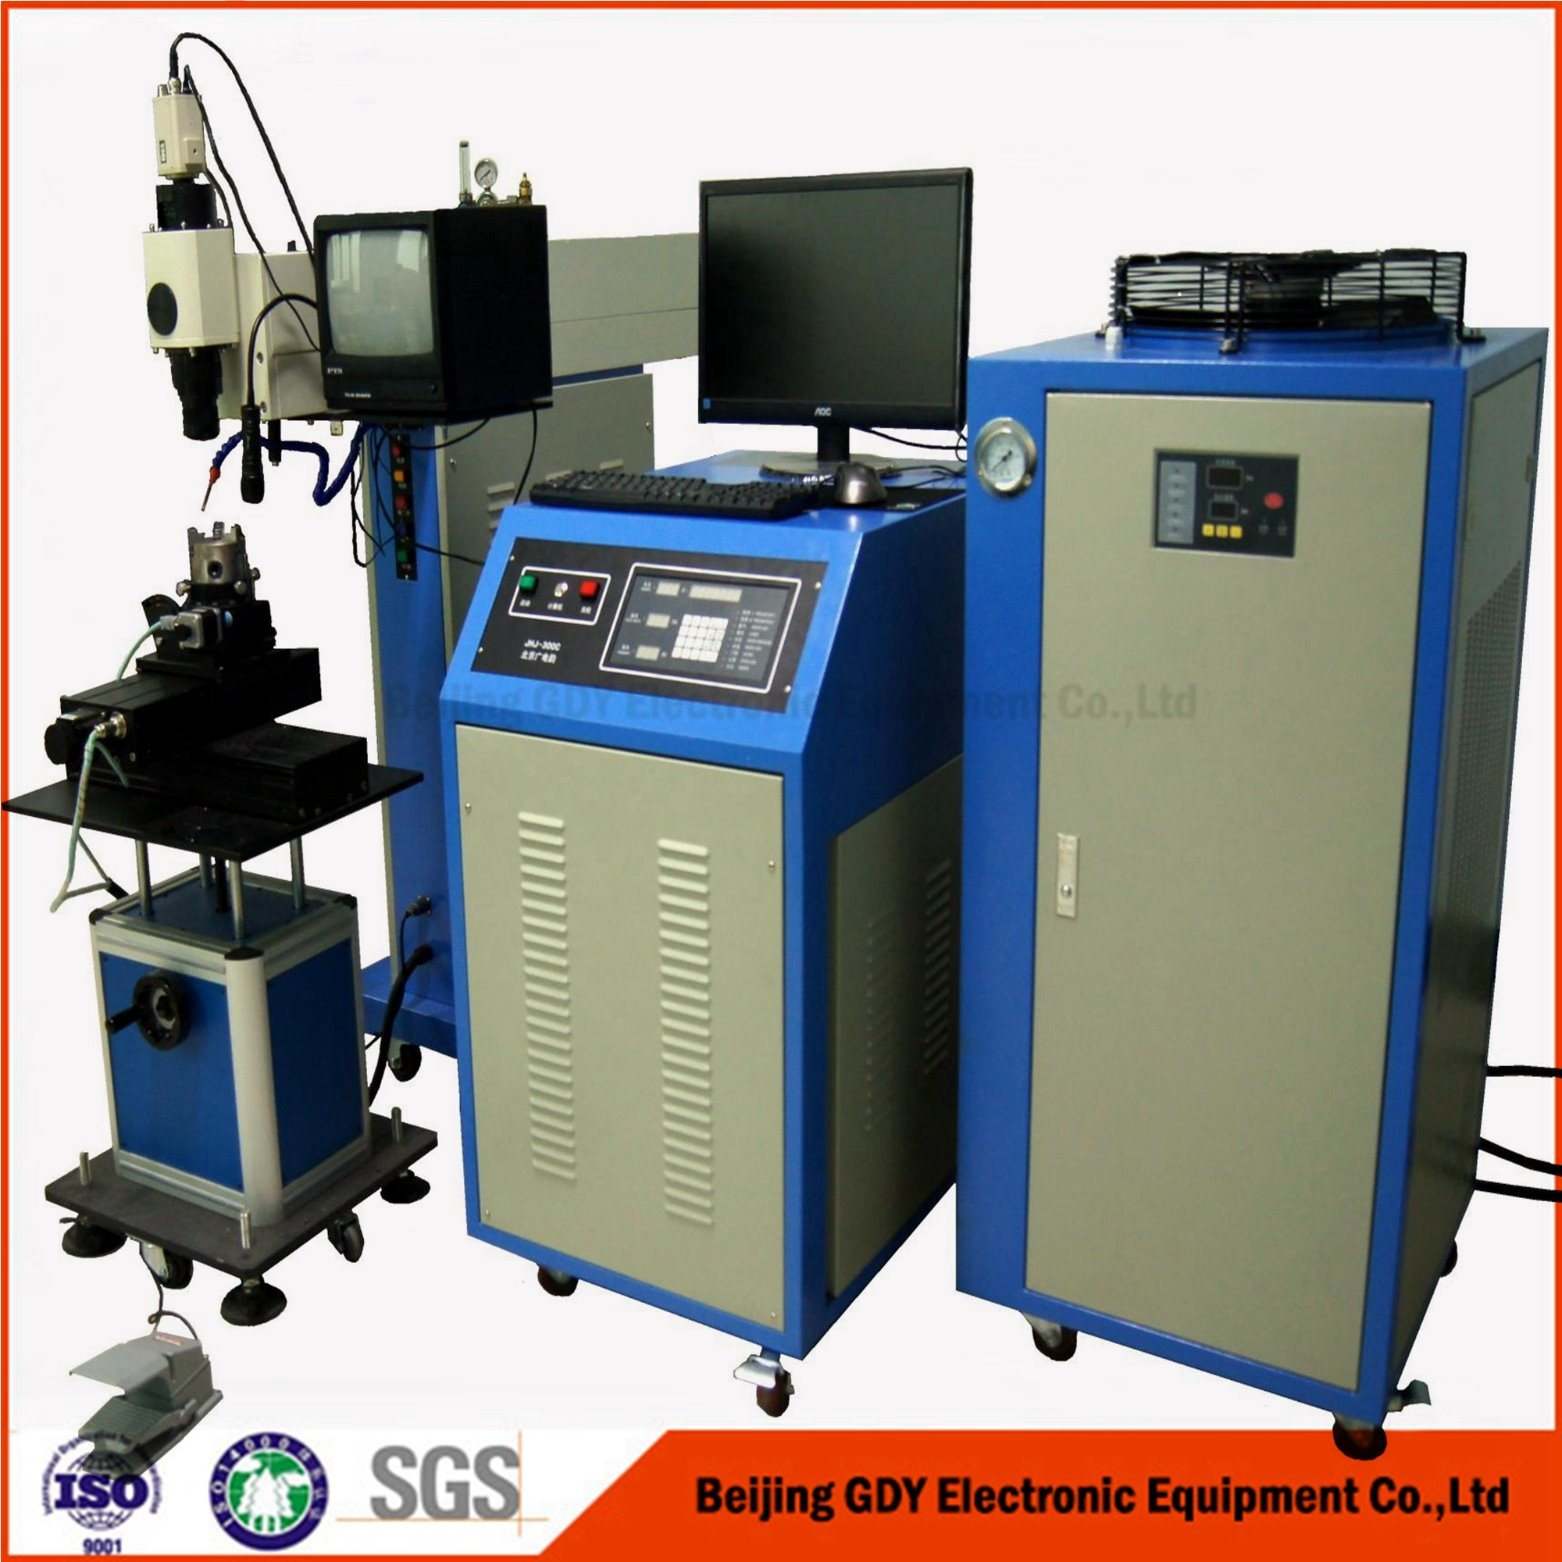 High Speed Low Cost Laser Welding Machine